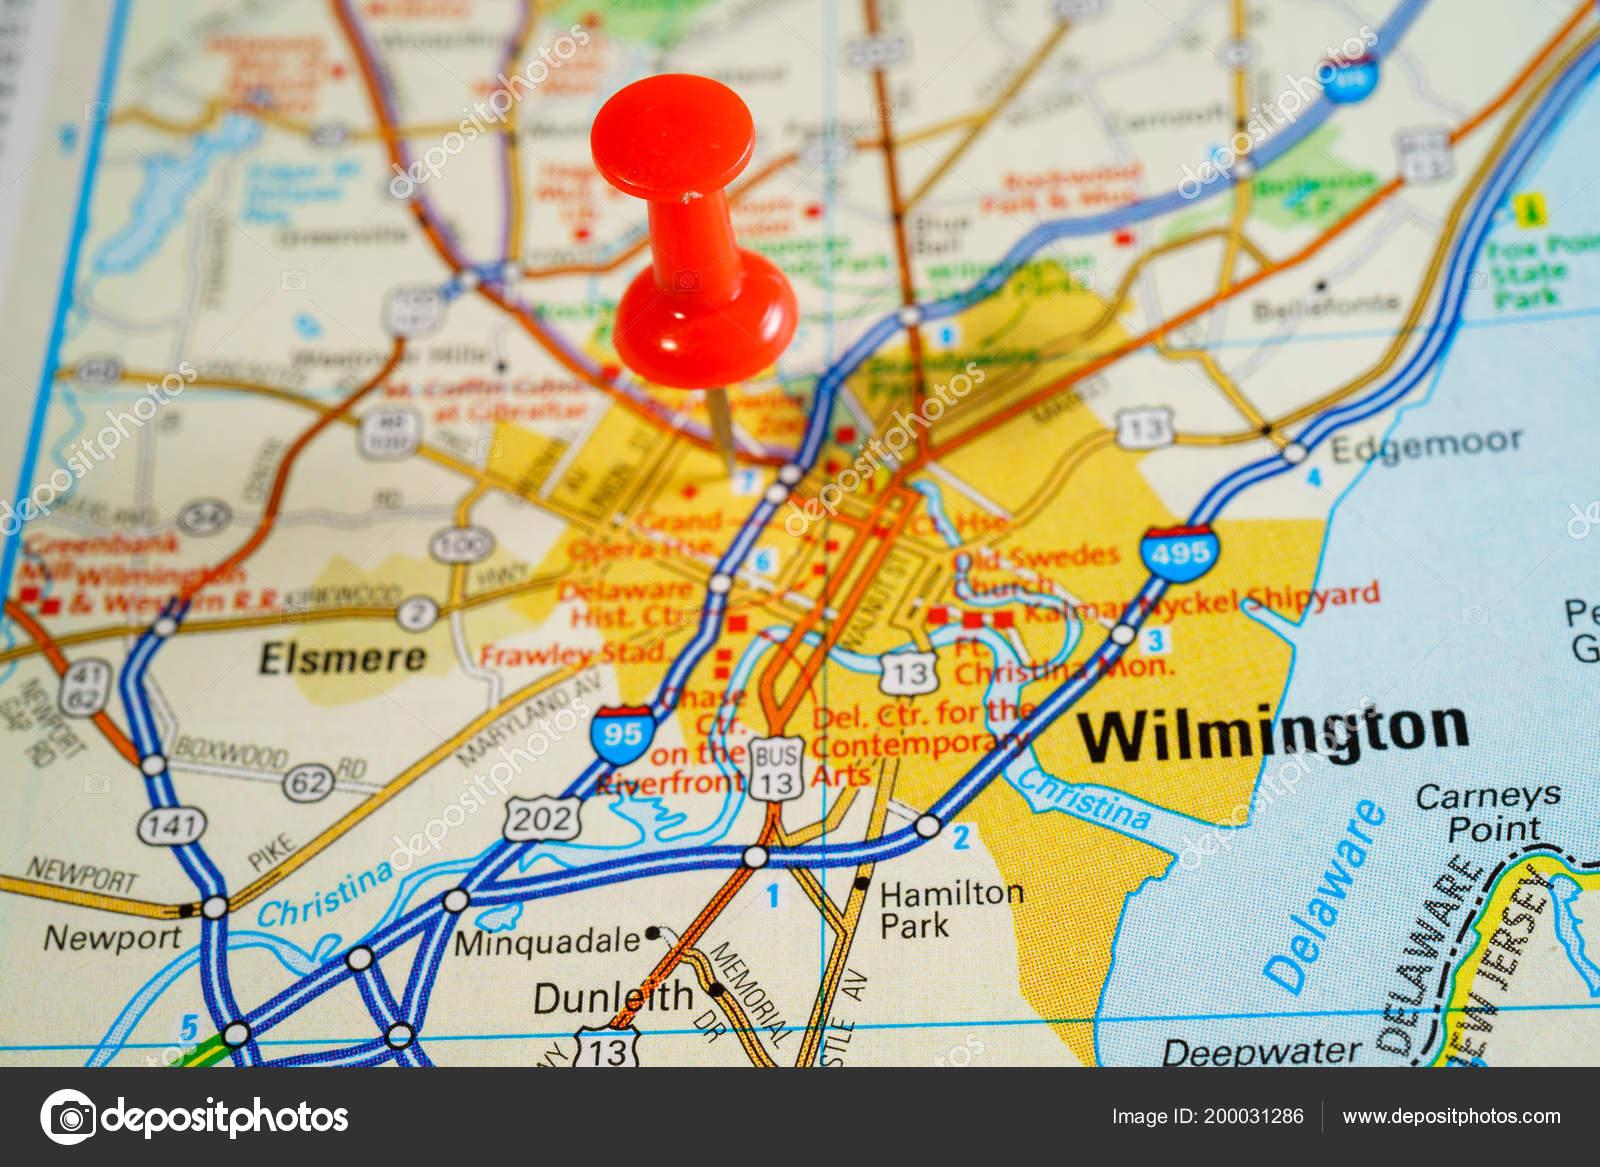 Wilmington United States Map — Stockfoto © aallm #200031286